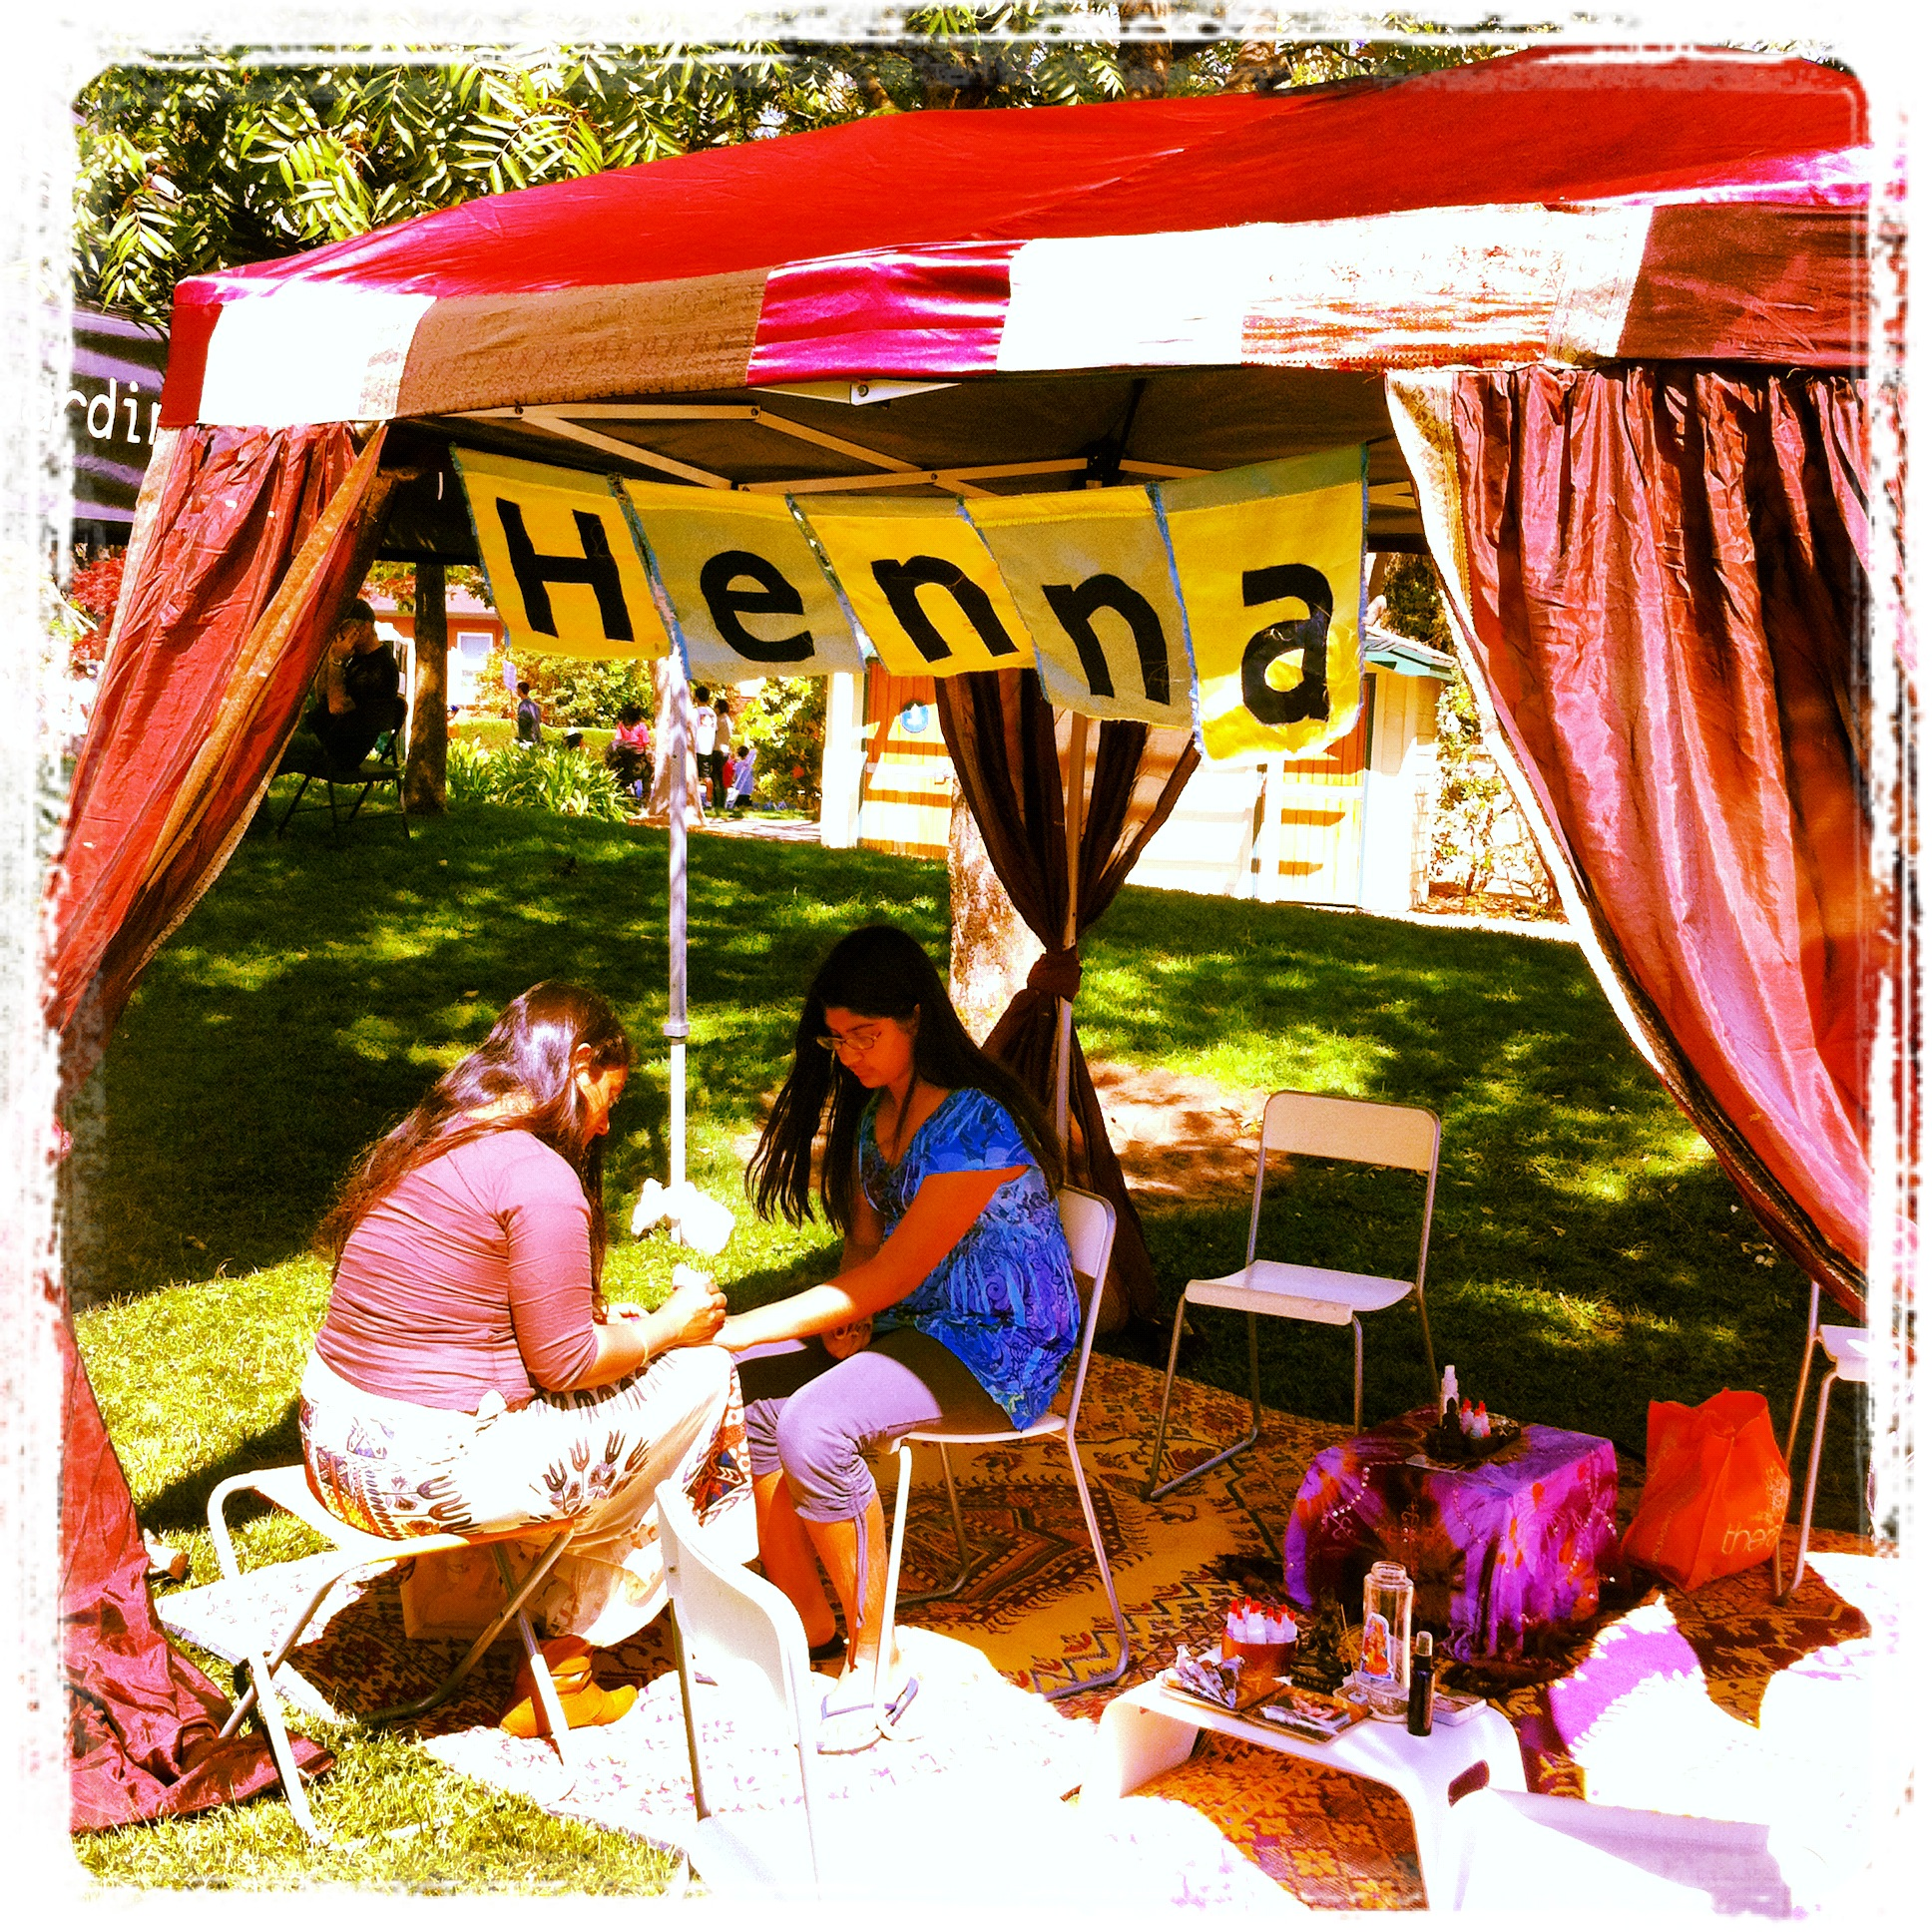 The Henna Lounge